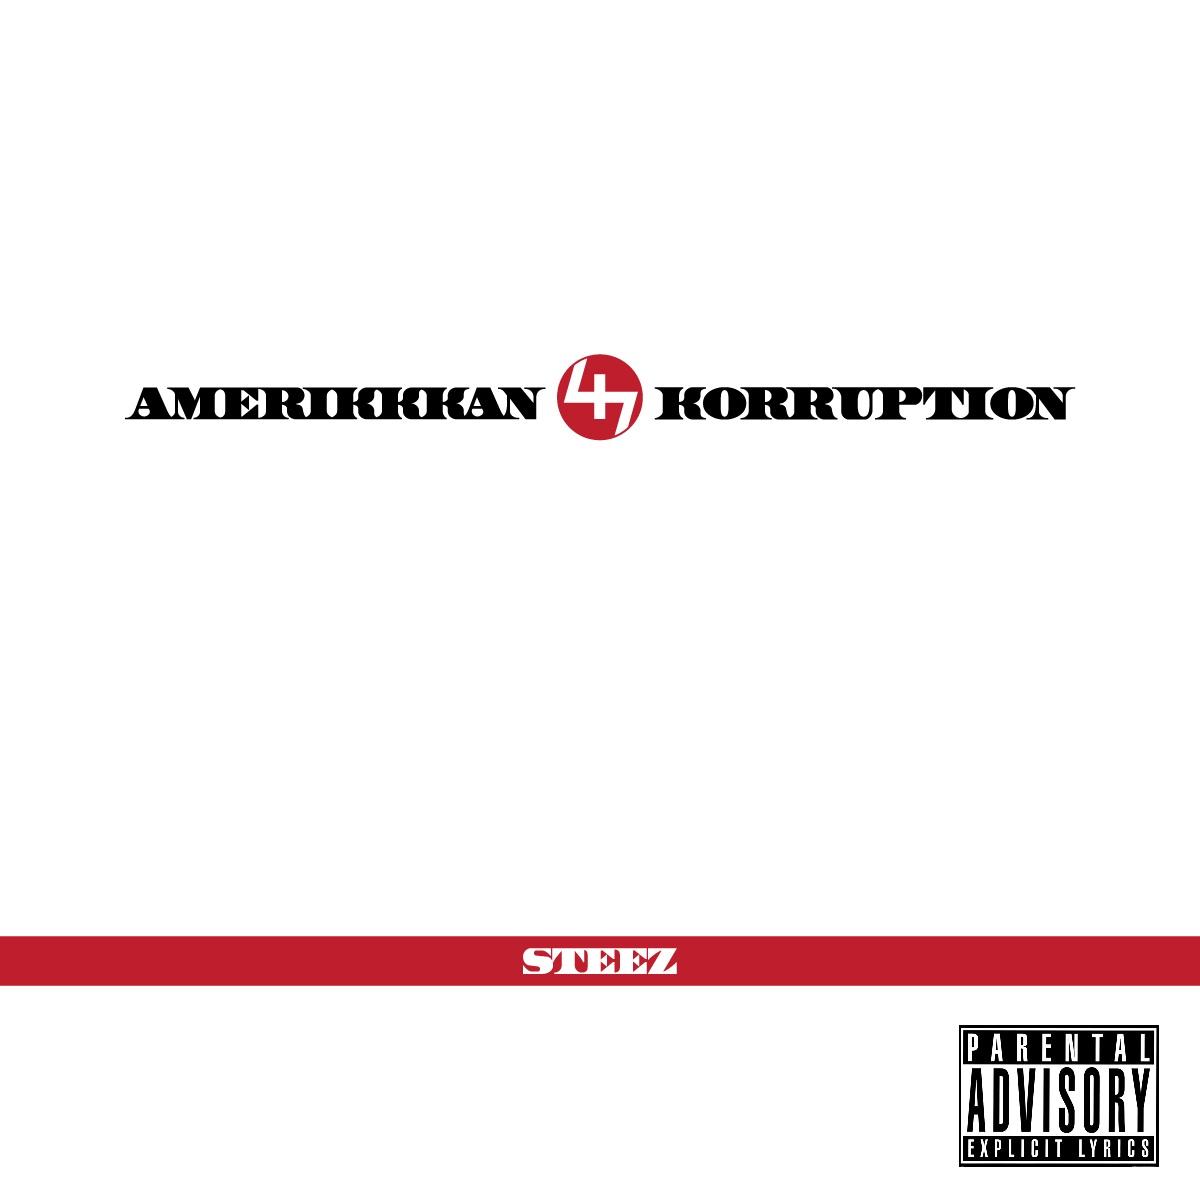 AmeriKKKan Korruption